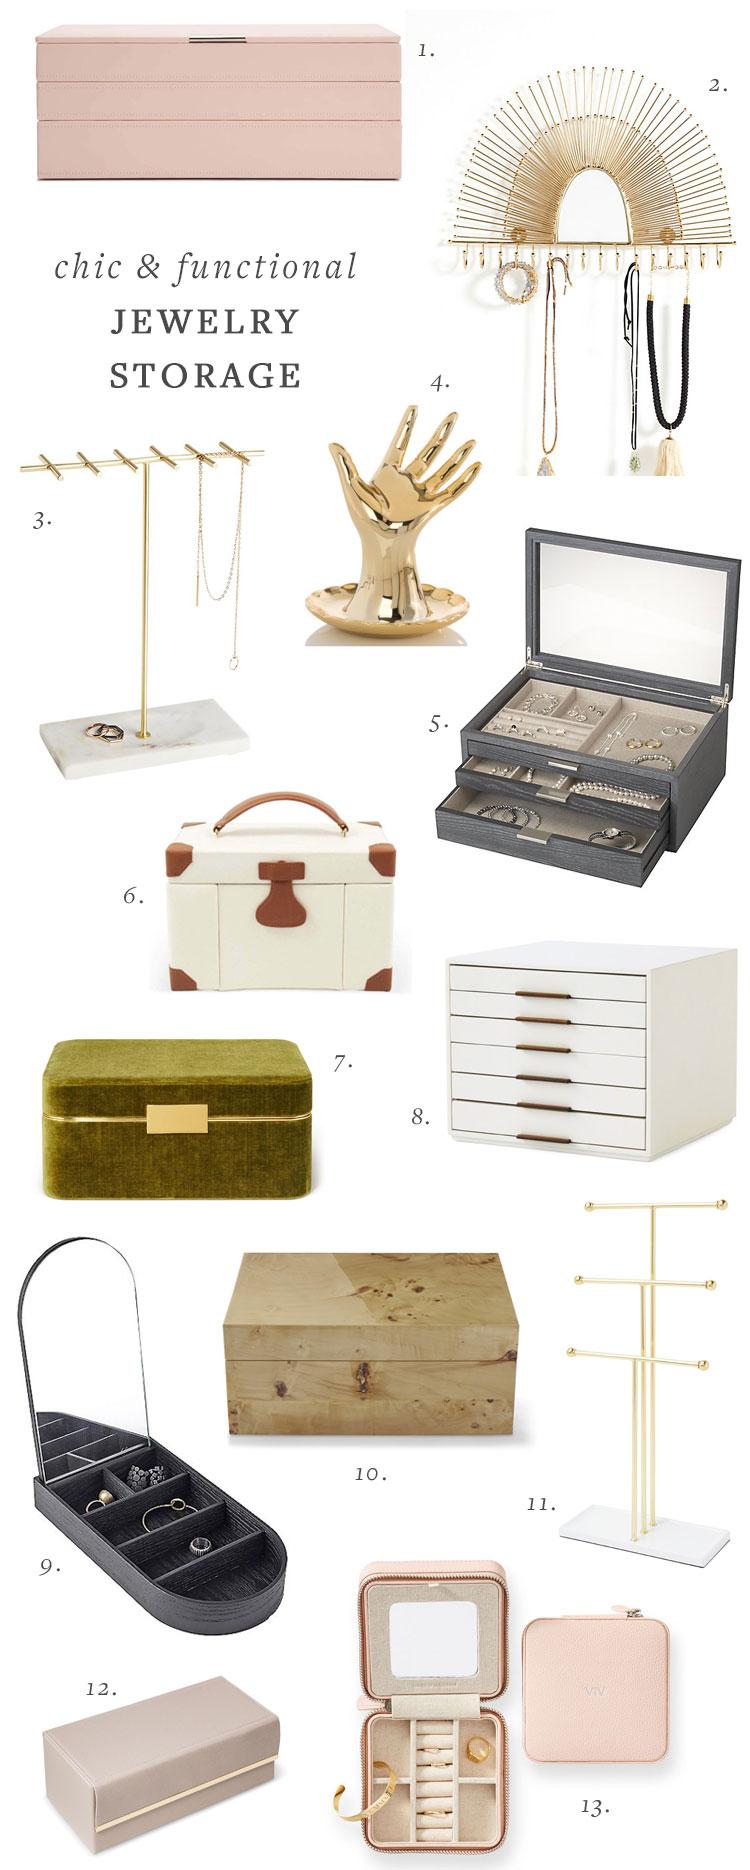 20+ Functional and Stylish Jewelry Storage Ideas! #jewelrystorage #smallspaces #smallstorage #jewelrybox #jewelrystand #organization #storage #storageideas